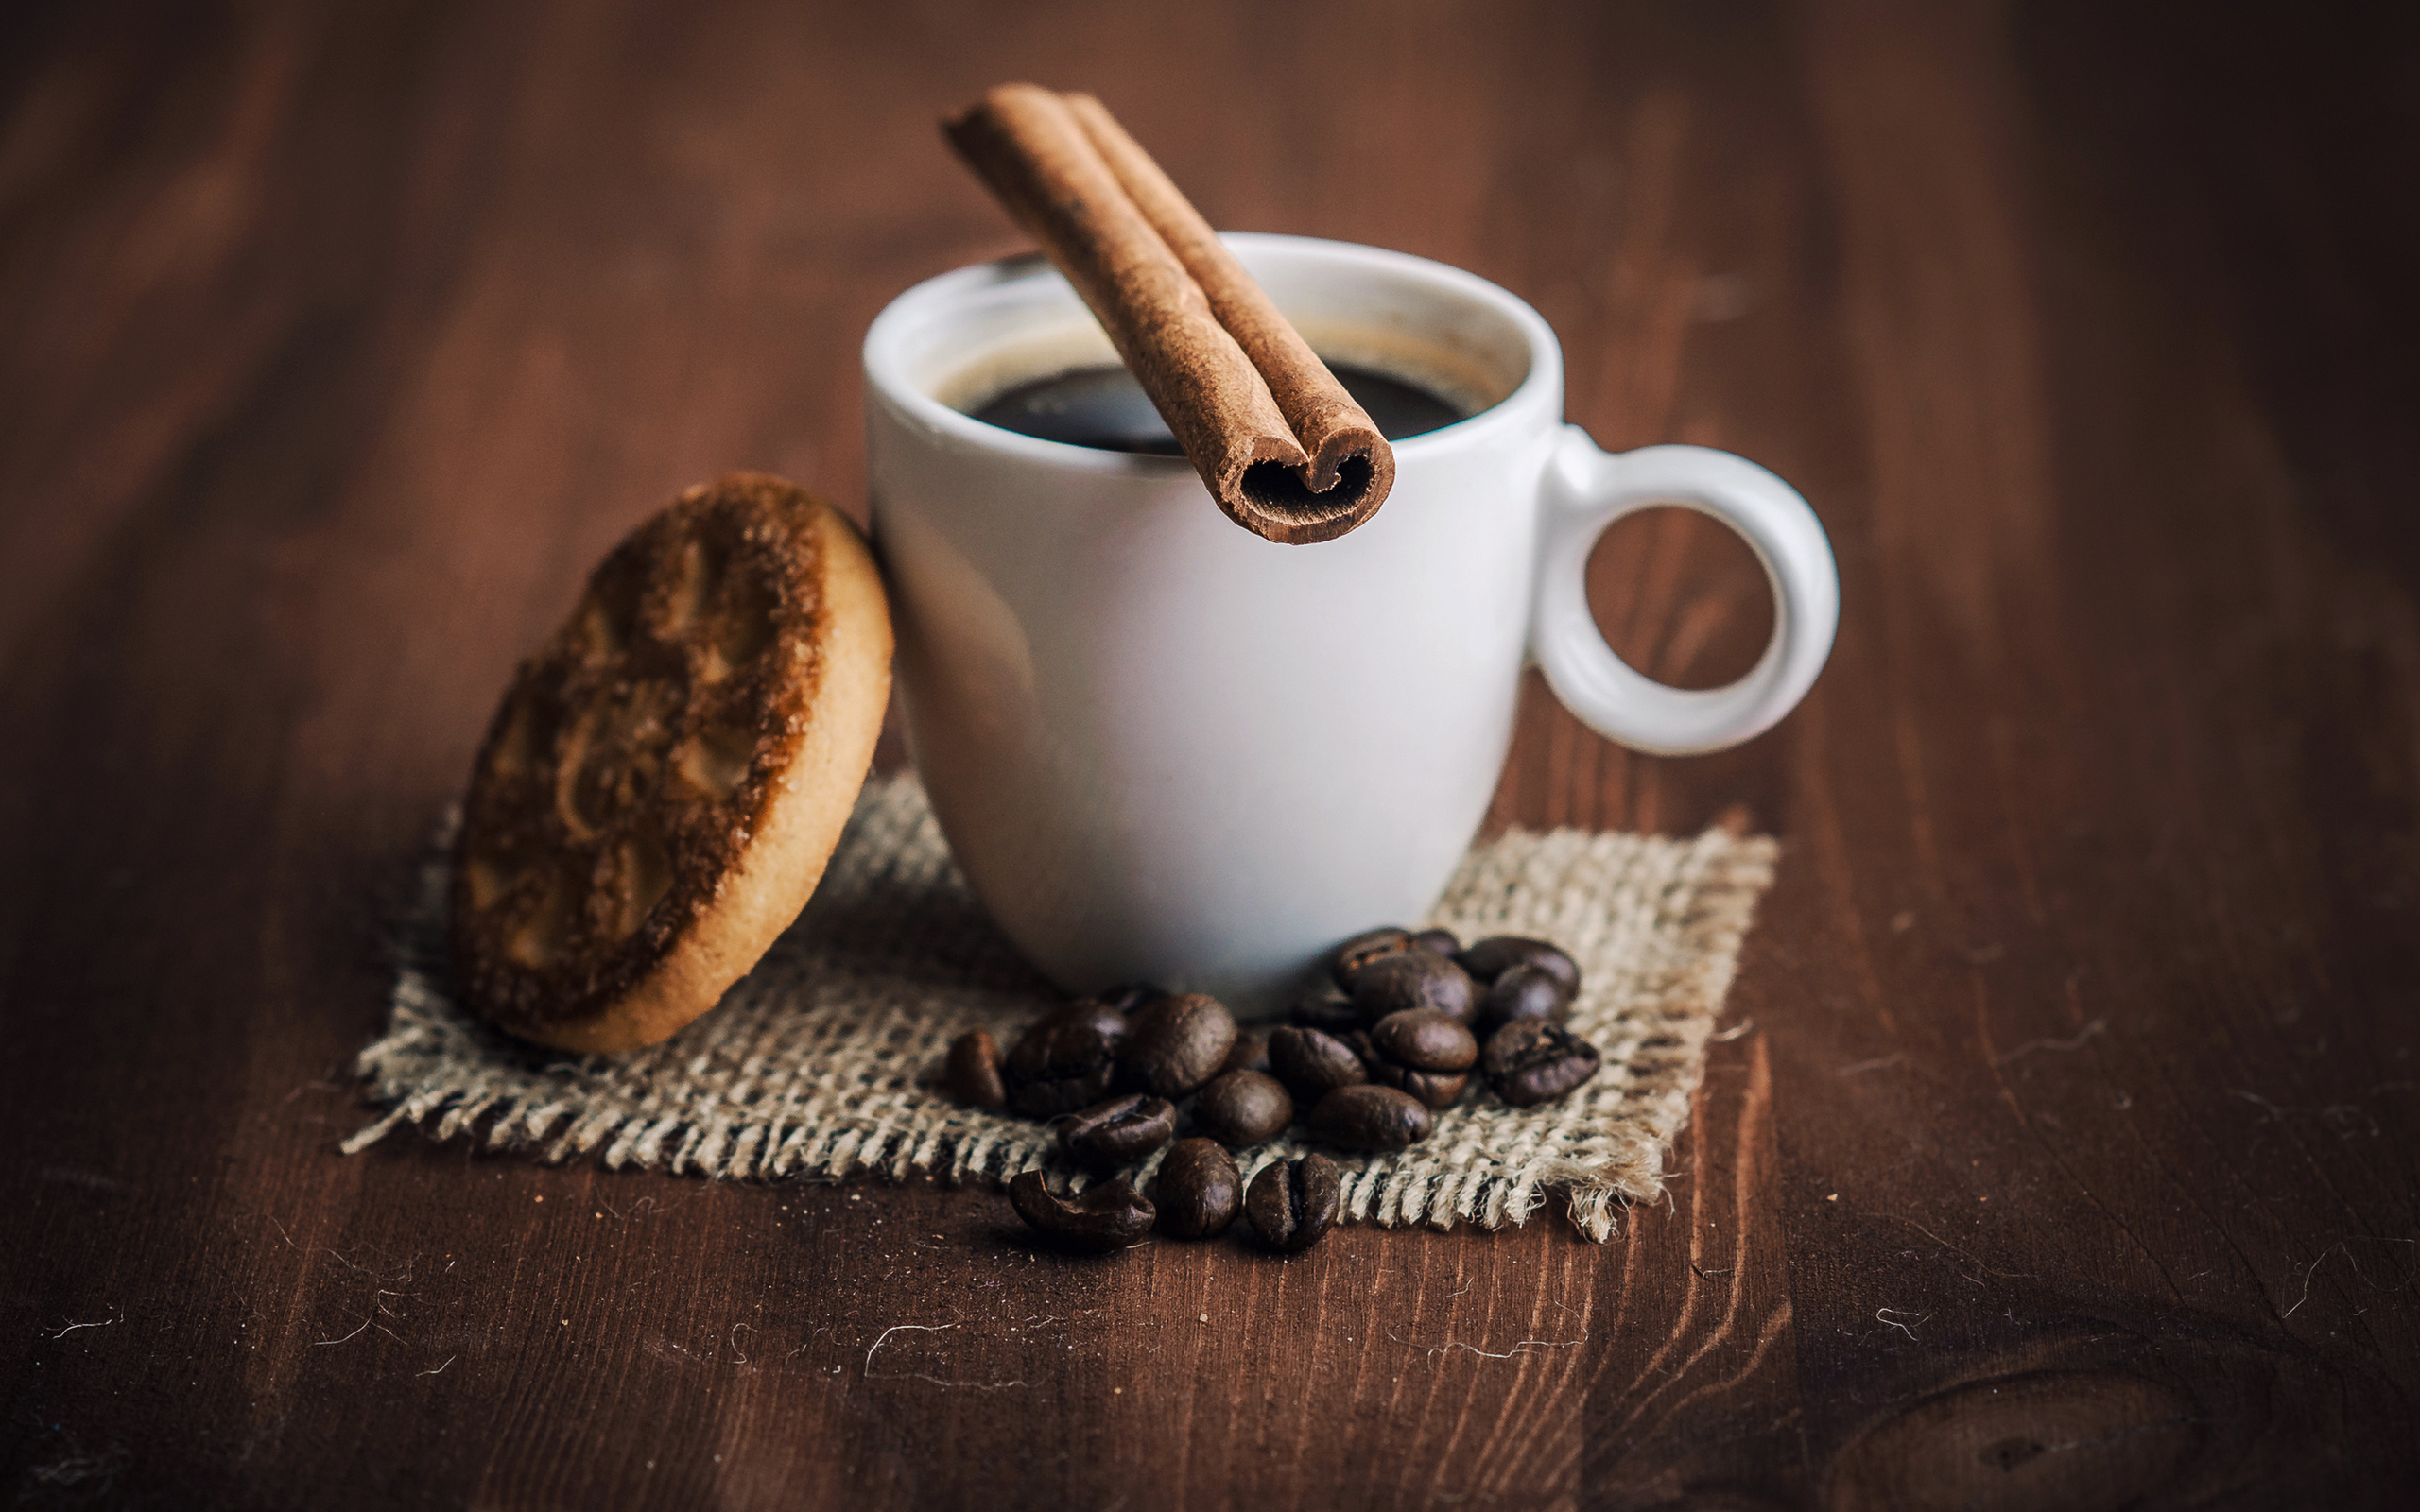 корица кофе чашка cinnamon coffee Cup  № 1119842 без смс